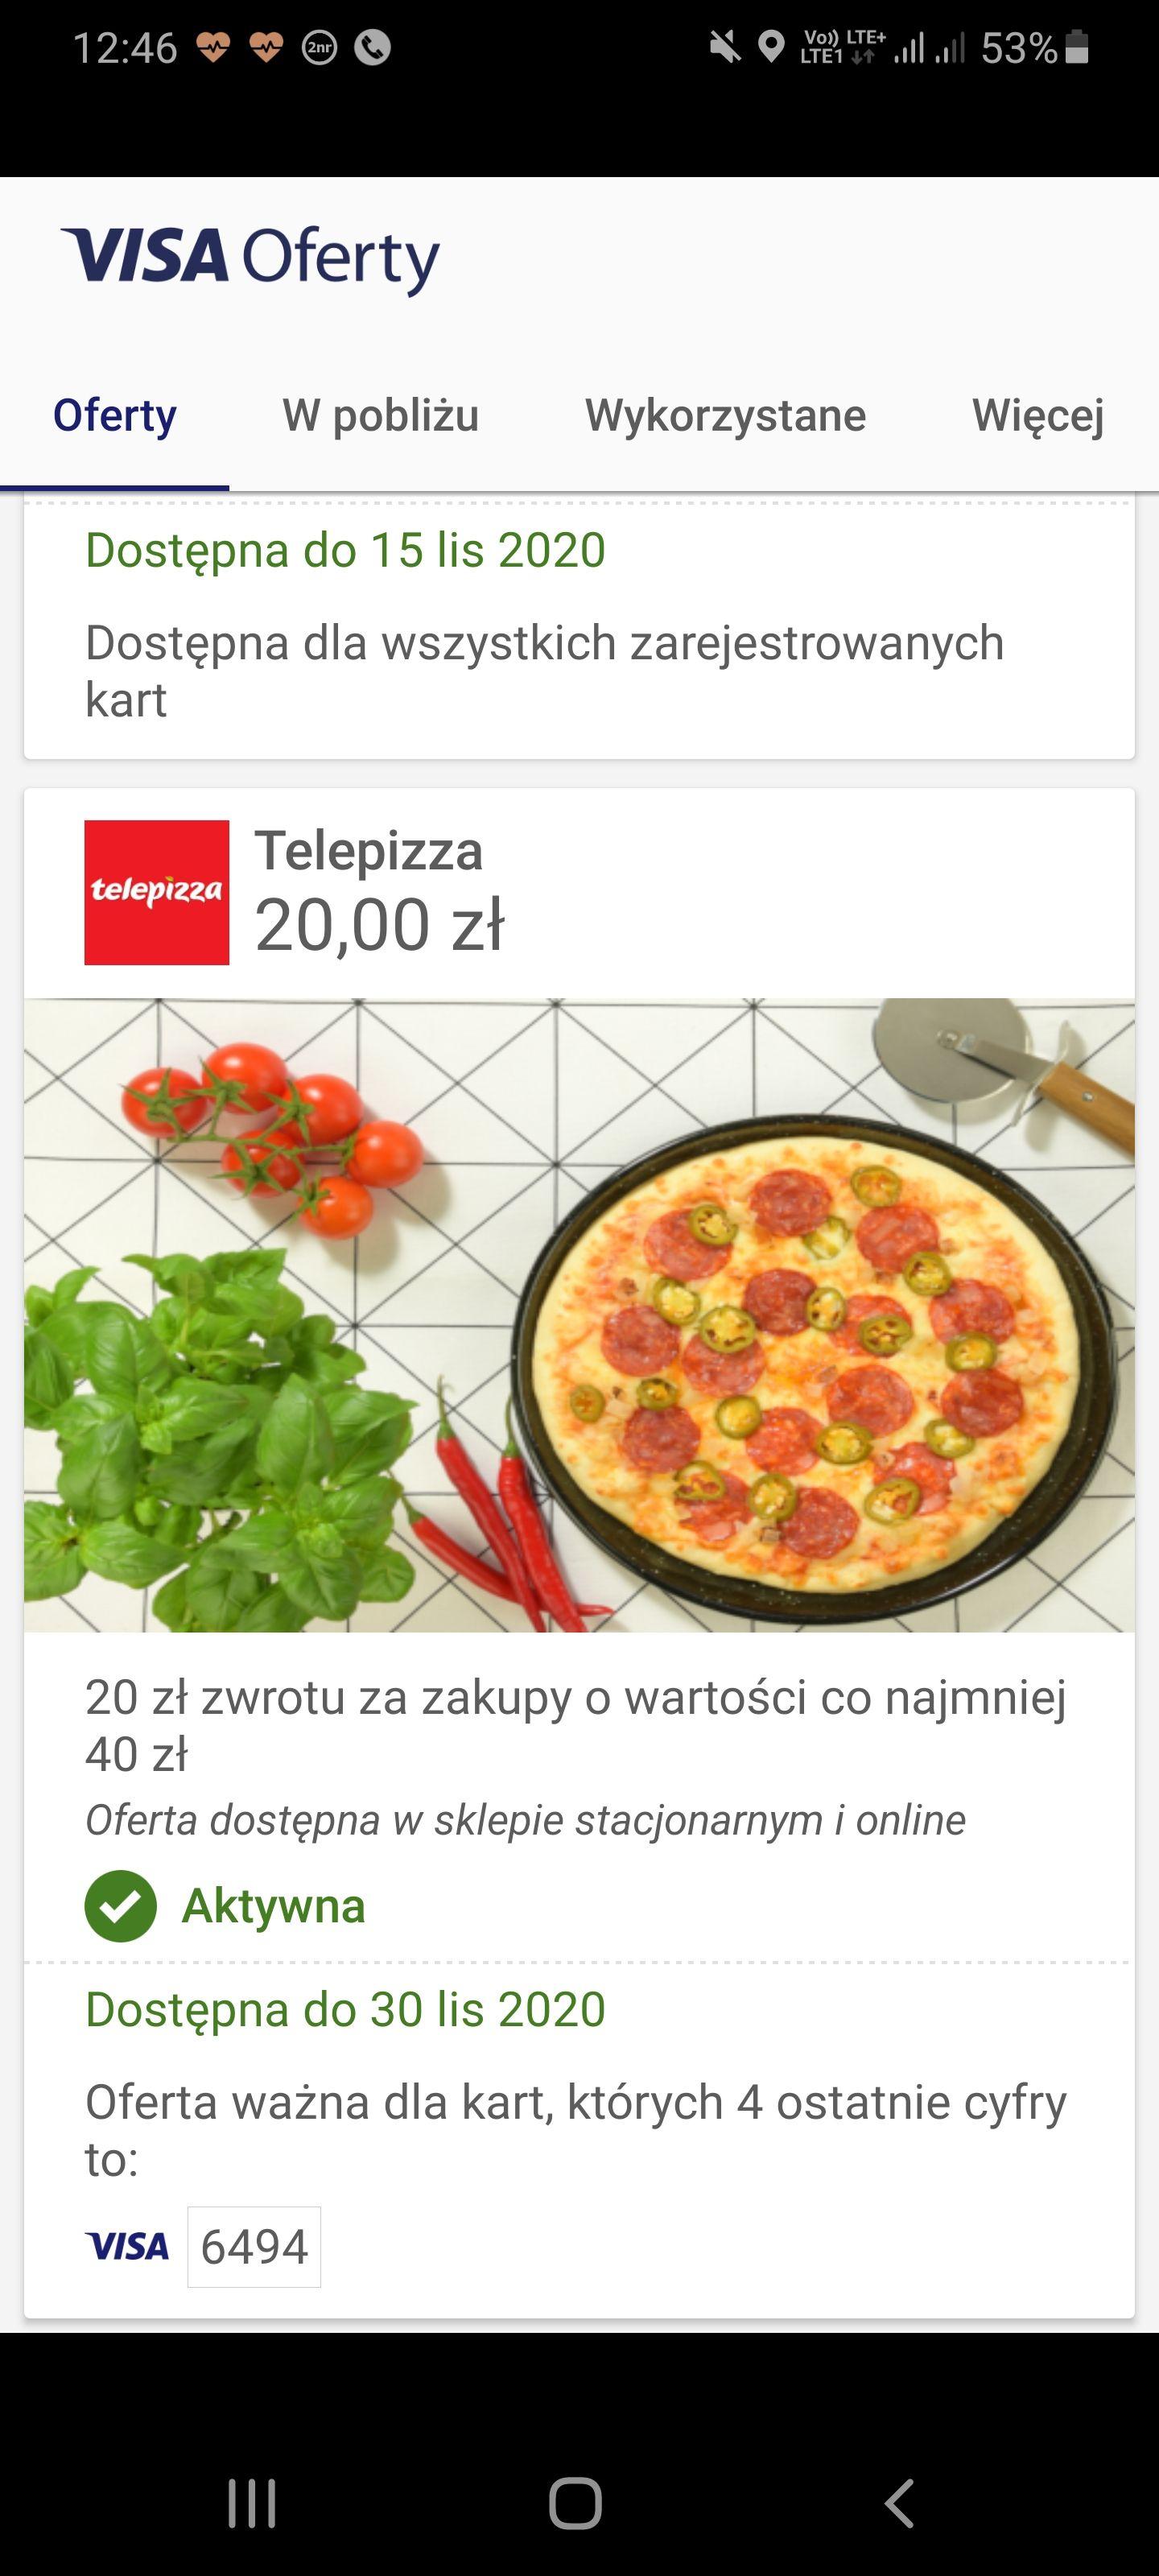 Telepizza 20/40zl @VISAOFERTY@TELEPIZZA.PL